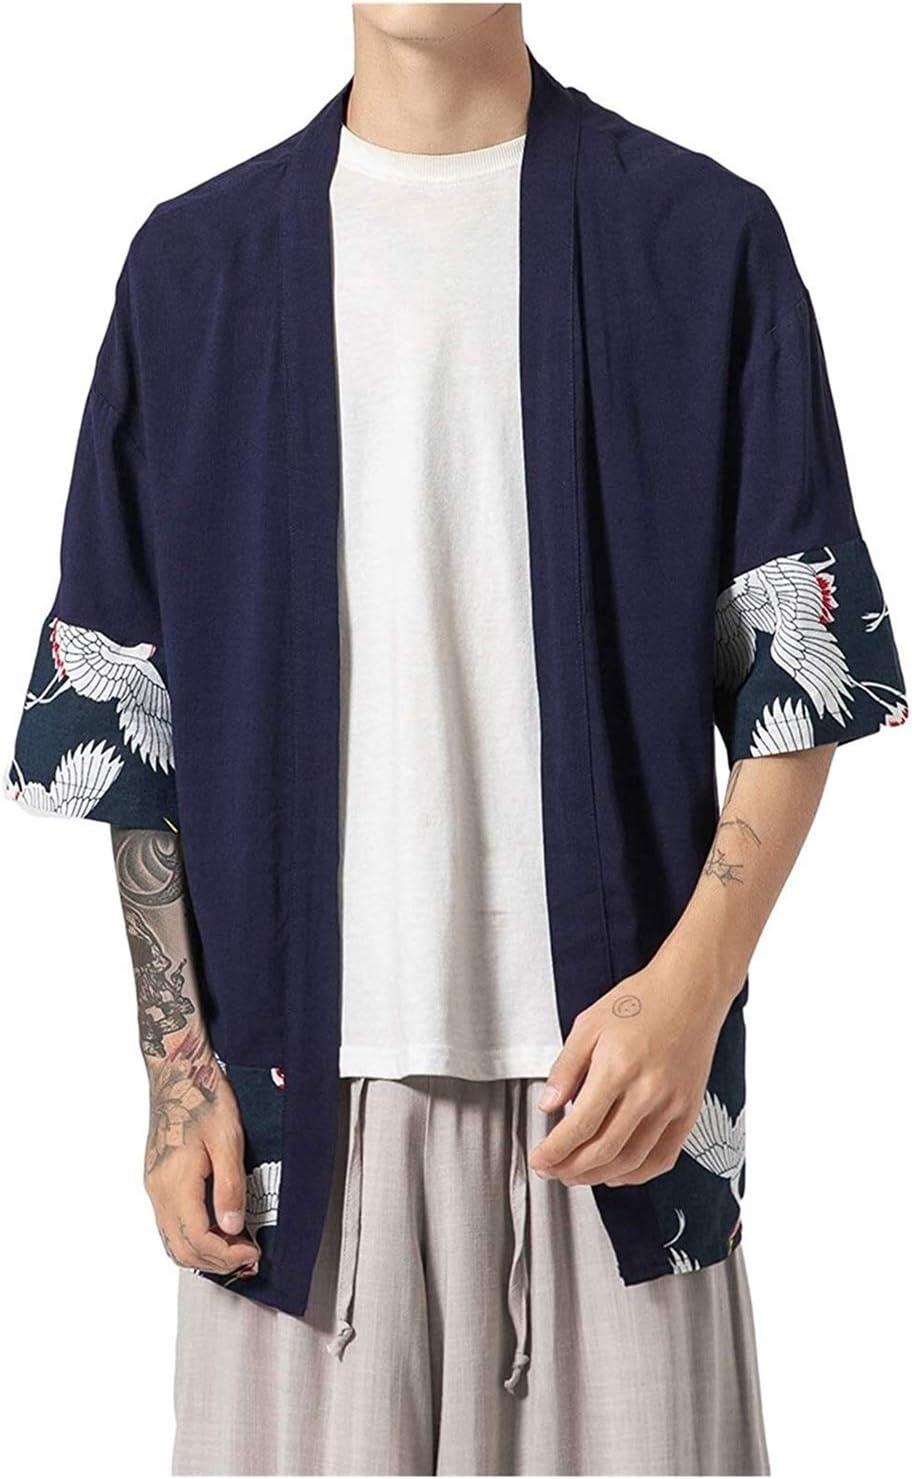 LINFENG Men's Japanese Fashion Kimono Cardigan Haori Jacket Cotton Linen Blends Vintage Cloak Open Front Loose Fit Yukata (Color : Natural, Size : XX-Large)